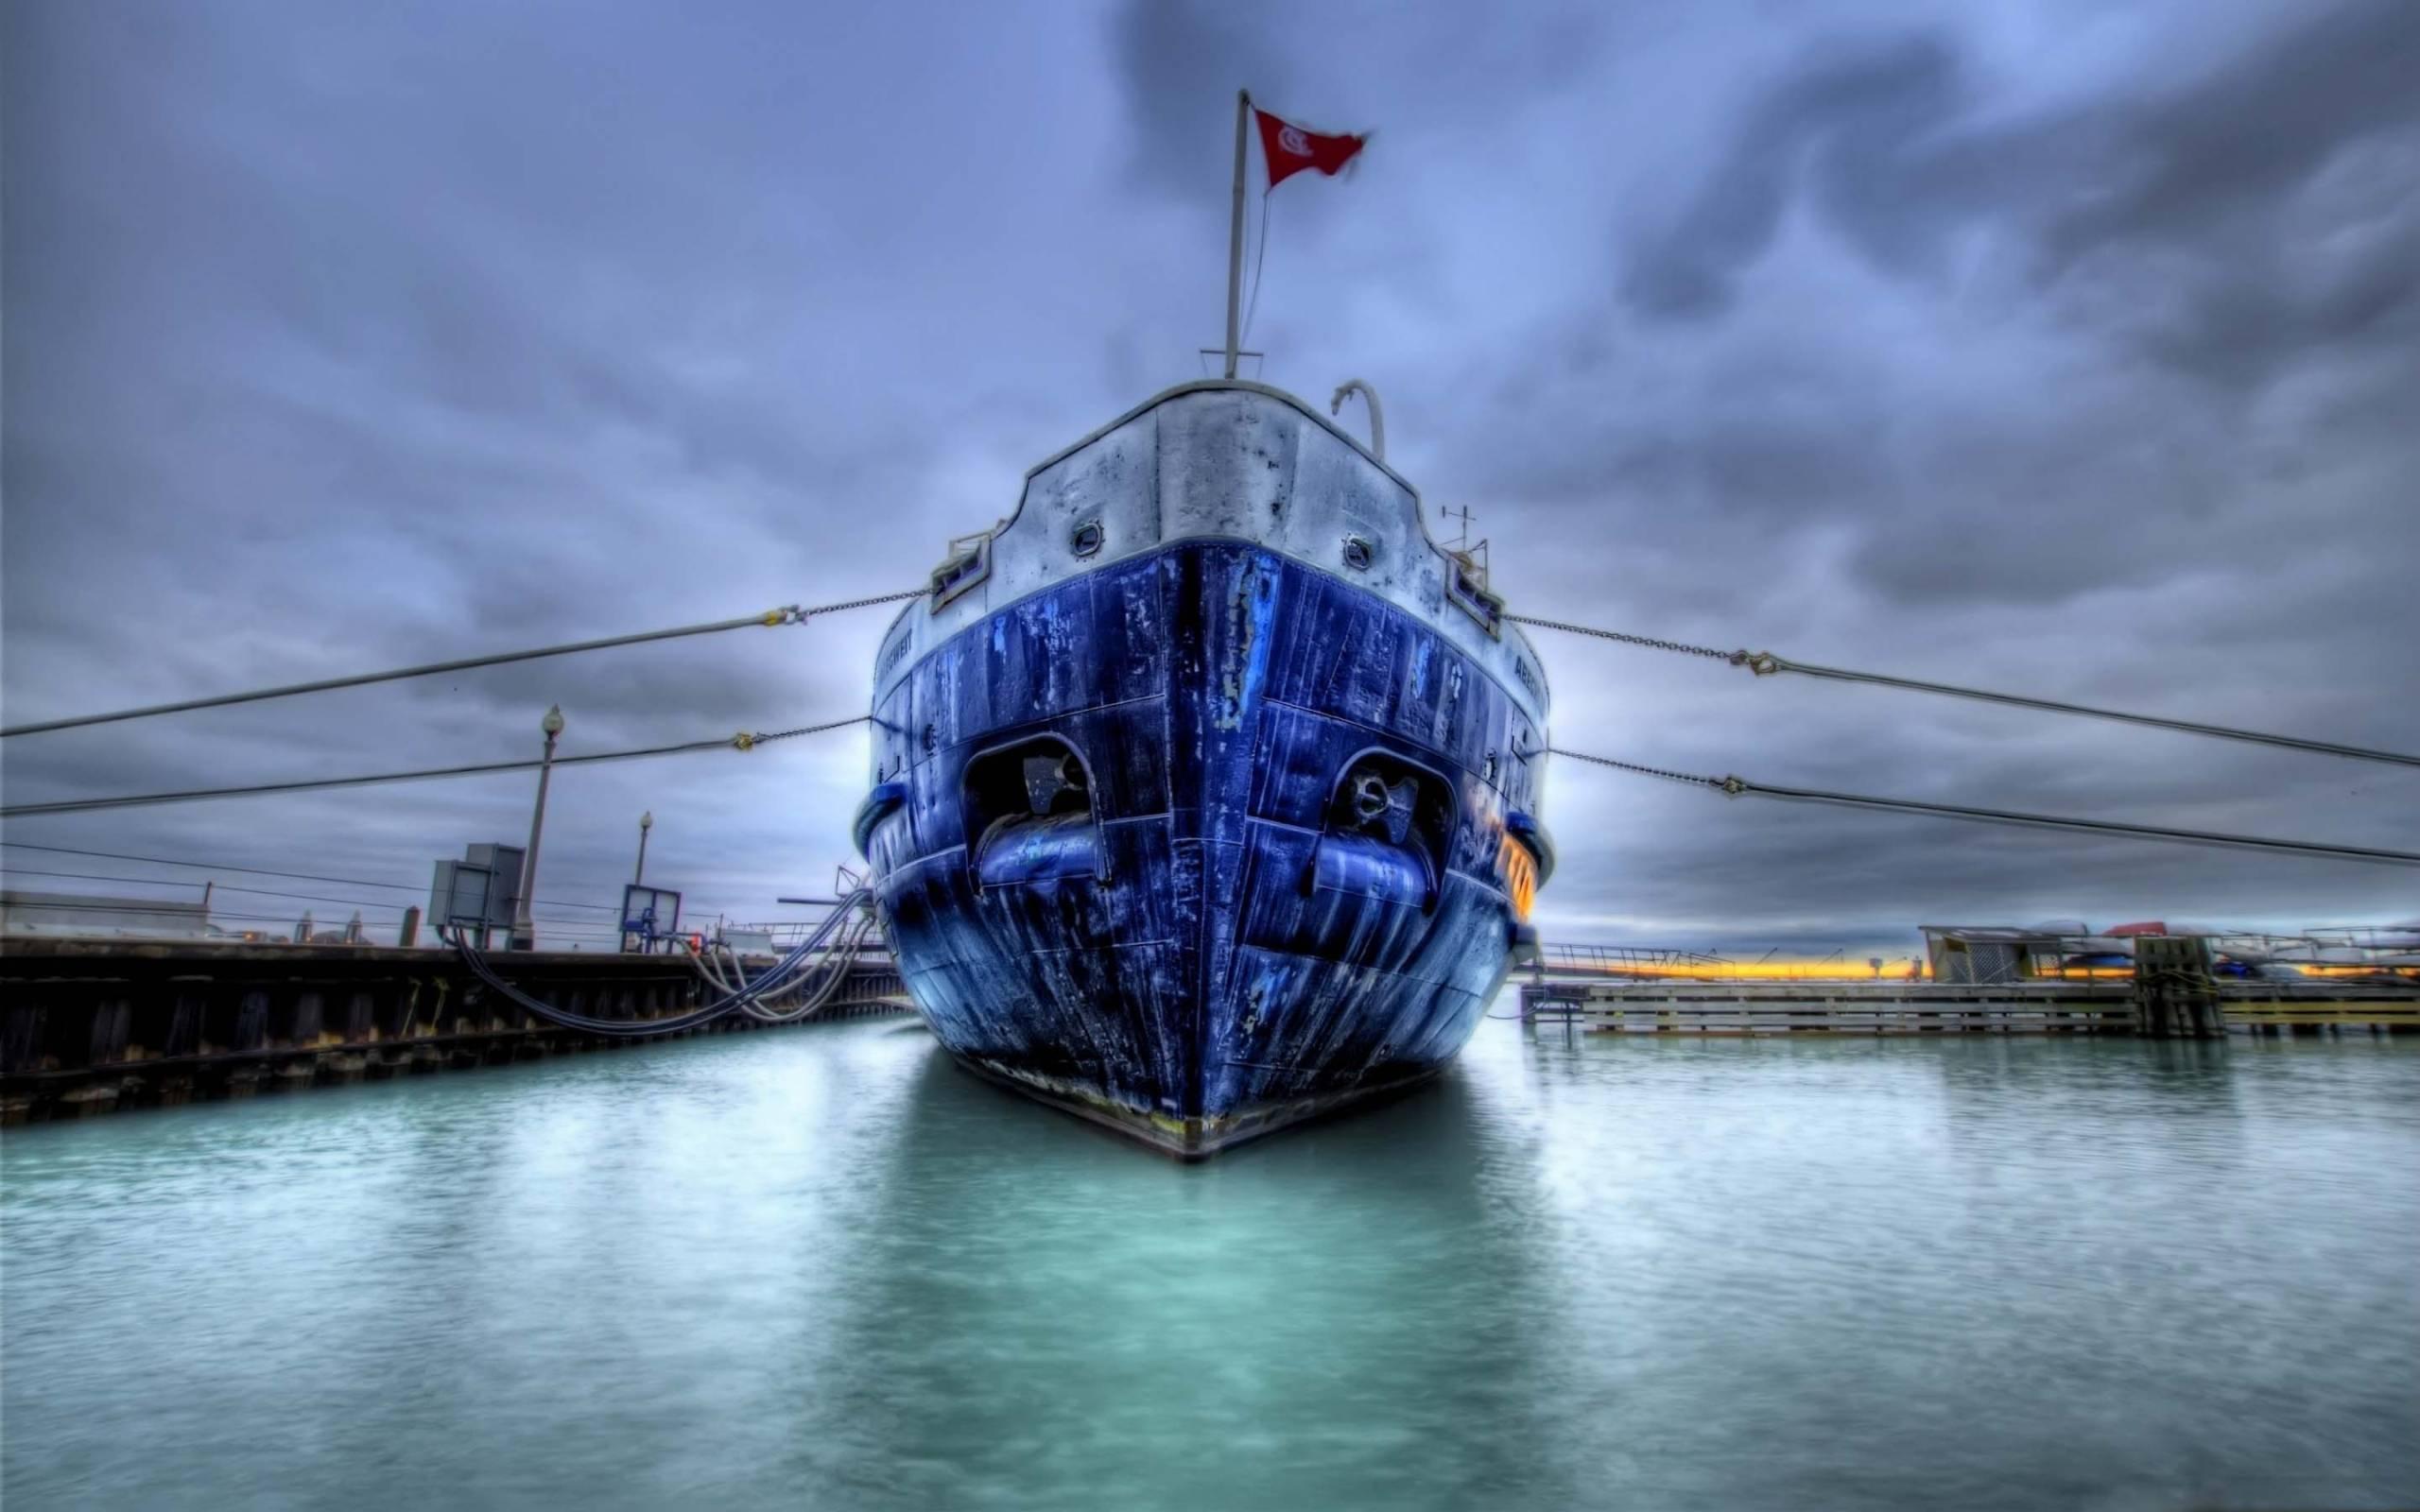 обои старое судно, флаг, порт картинки фото